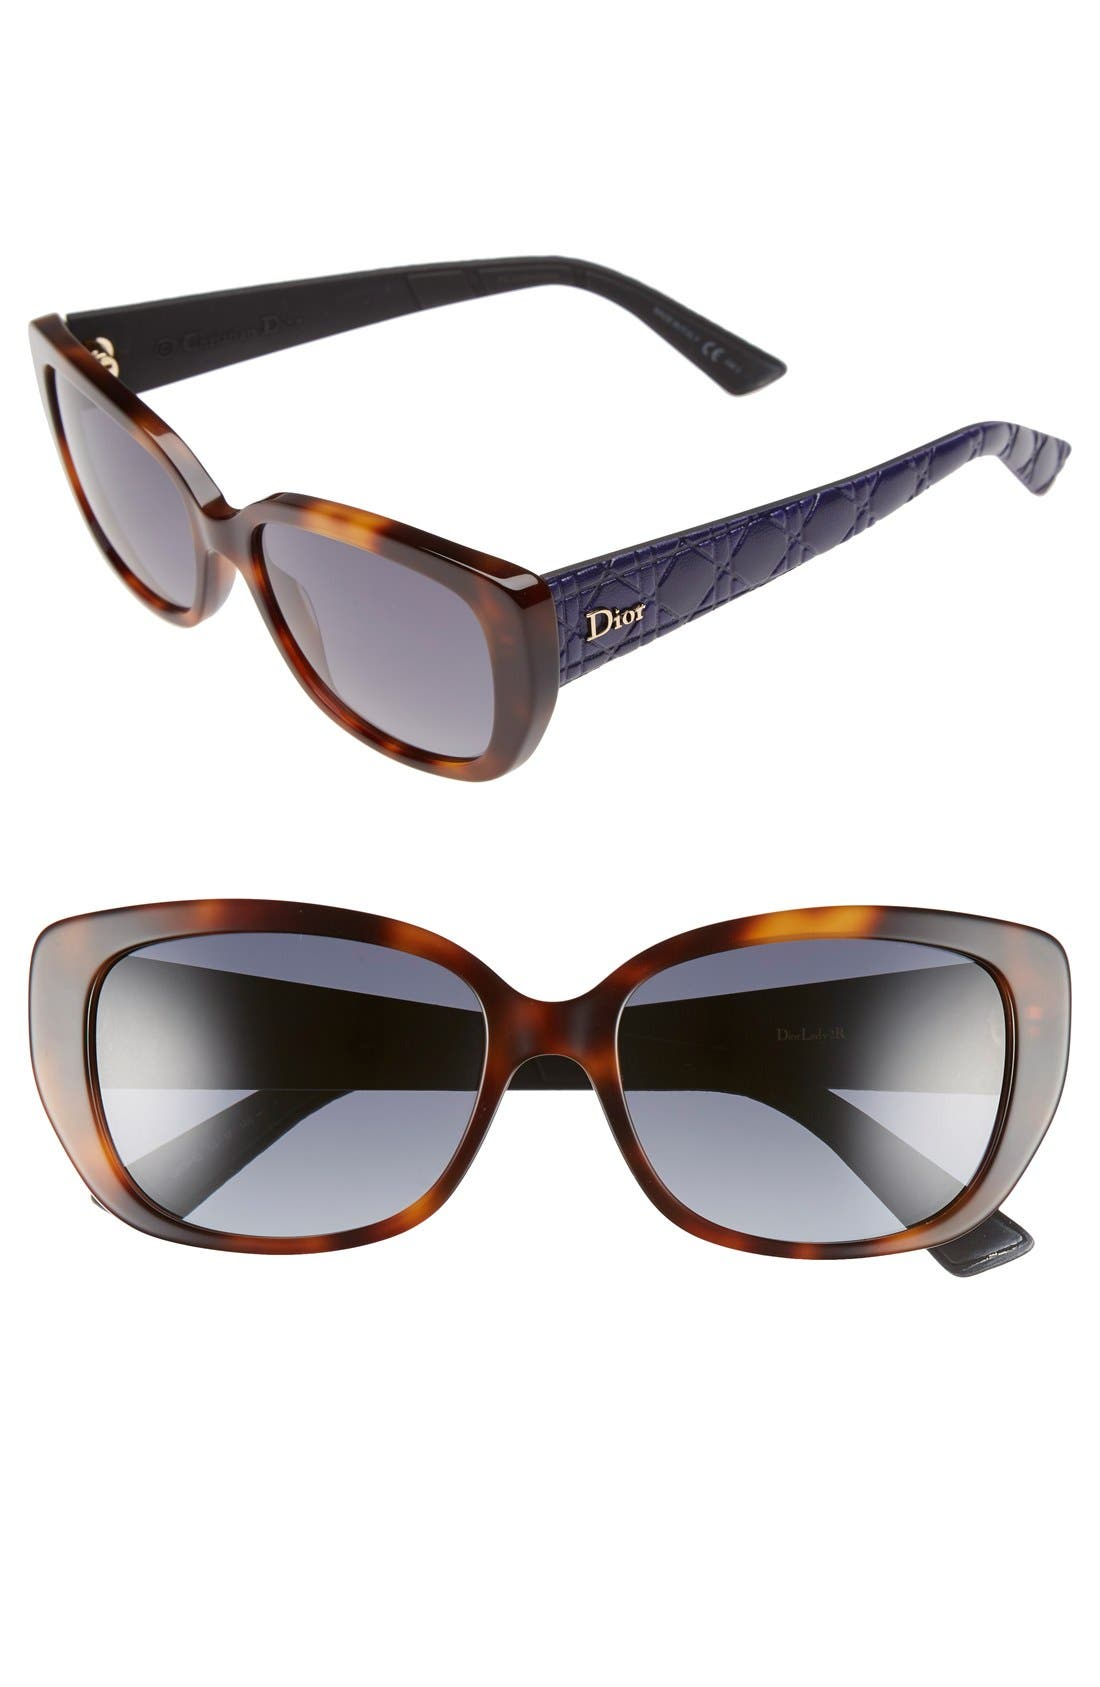 Lady 55mm Cat Eye Sunglasses,                         Main,                         color, Havana/ Blue